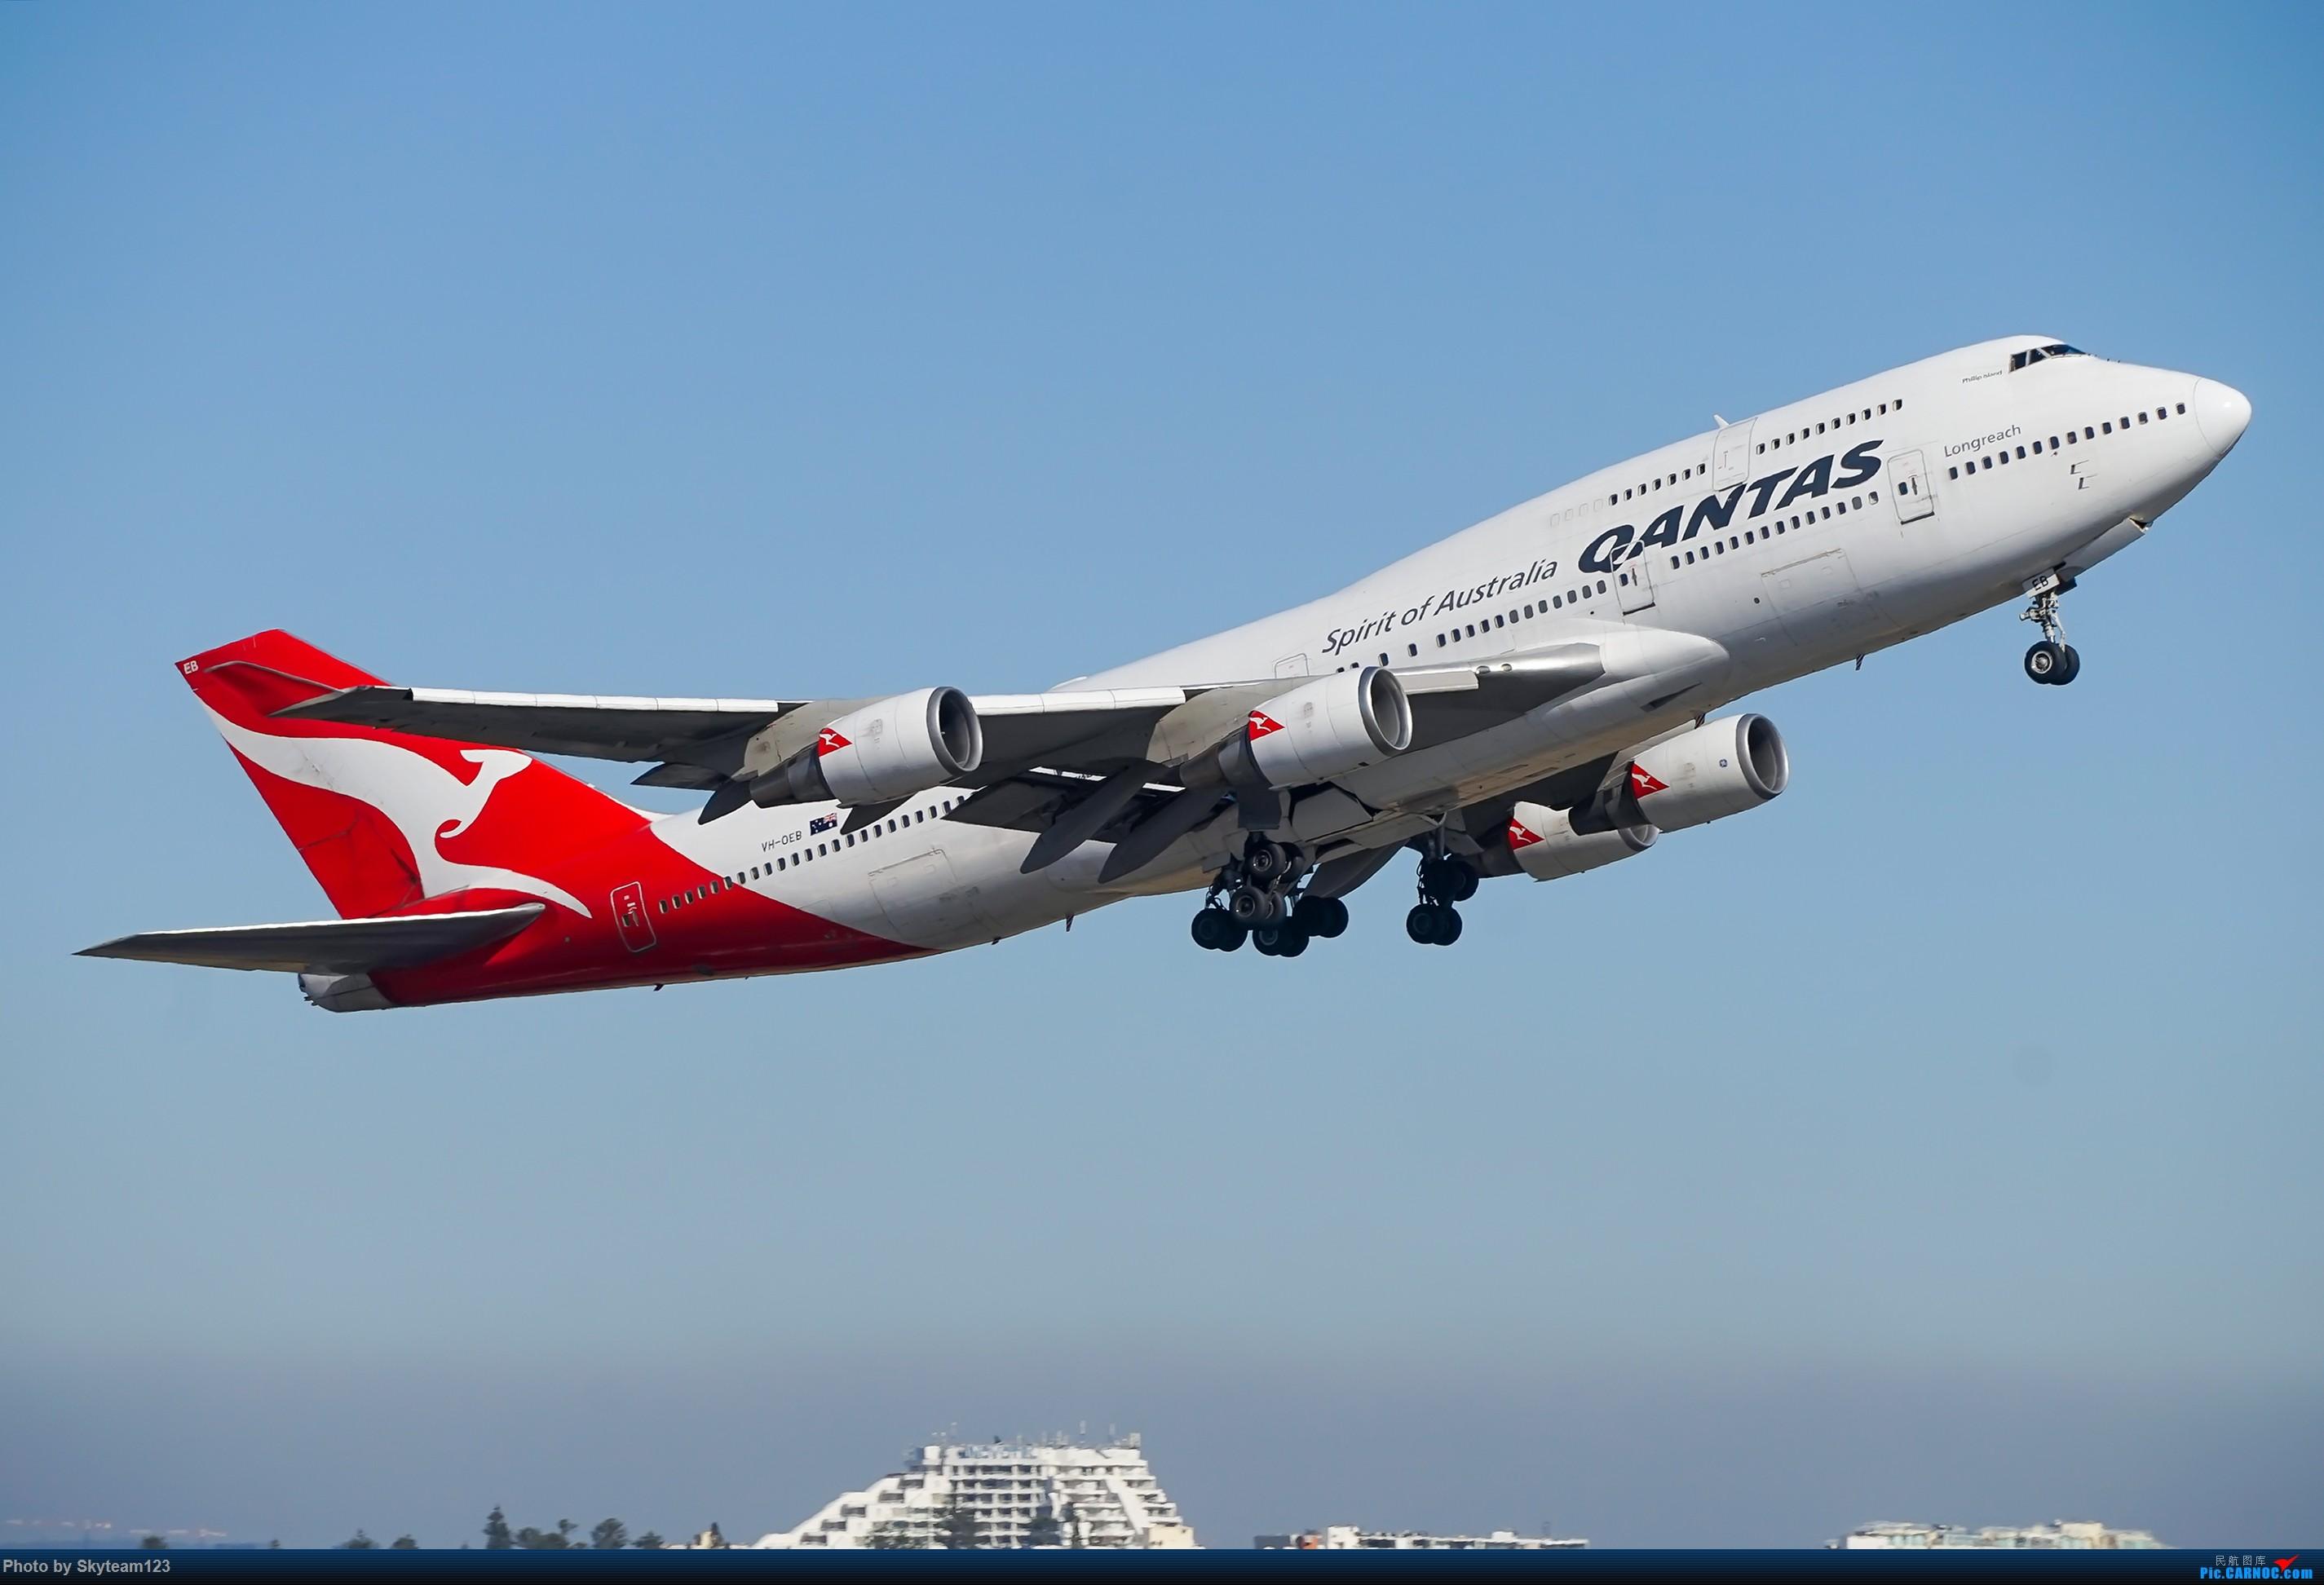 Re:[原创][SYD] 再访Blu EMU停车场 早上34L抵港出发杂图几张 BOEING 747-400 VH-OEB 澳大利亚悉尼金斯福德·史密斯机场